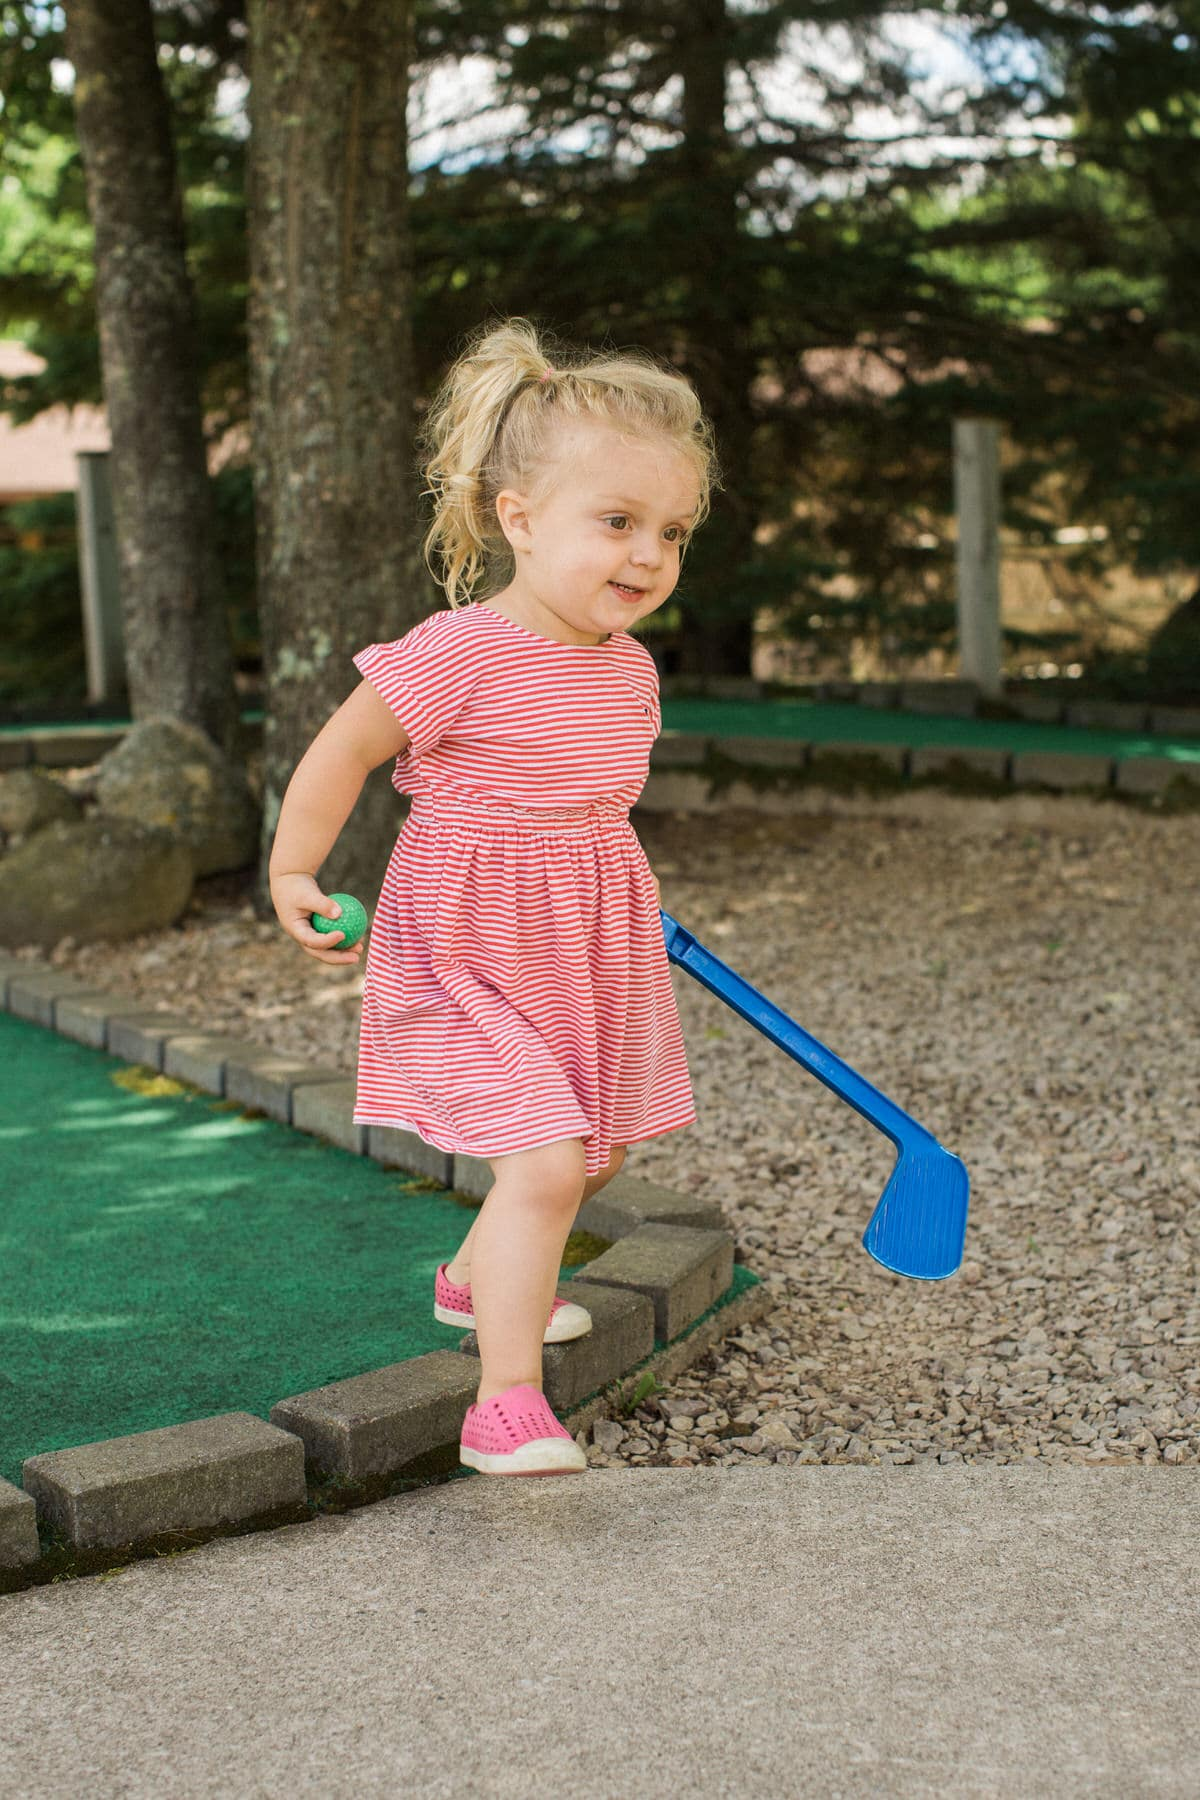 mini-golf-Crivitz-Wisconsin-fine-art-photography-by-Studio-L-photographer-Laura-Schneider-_9648